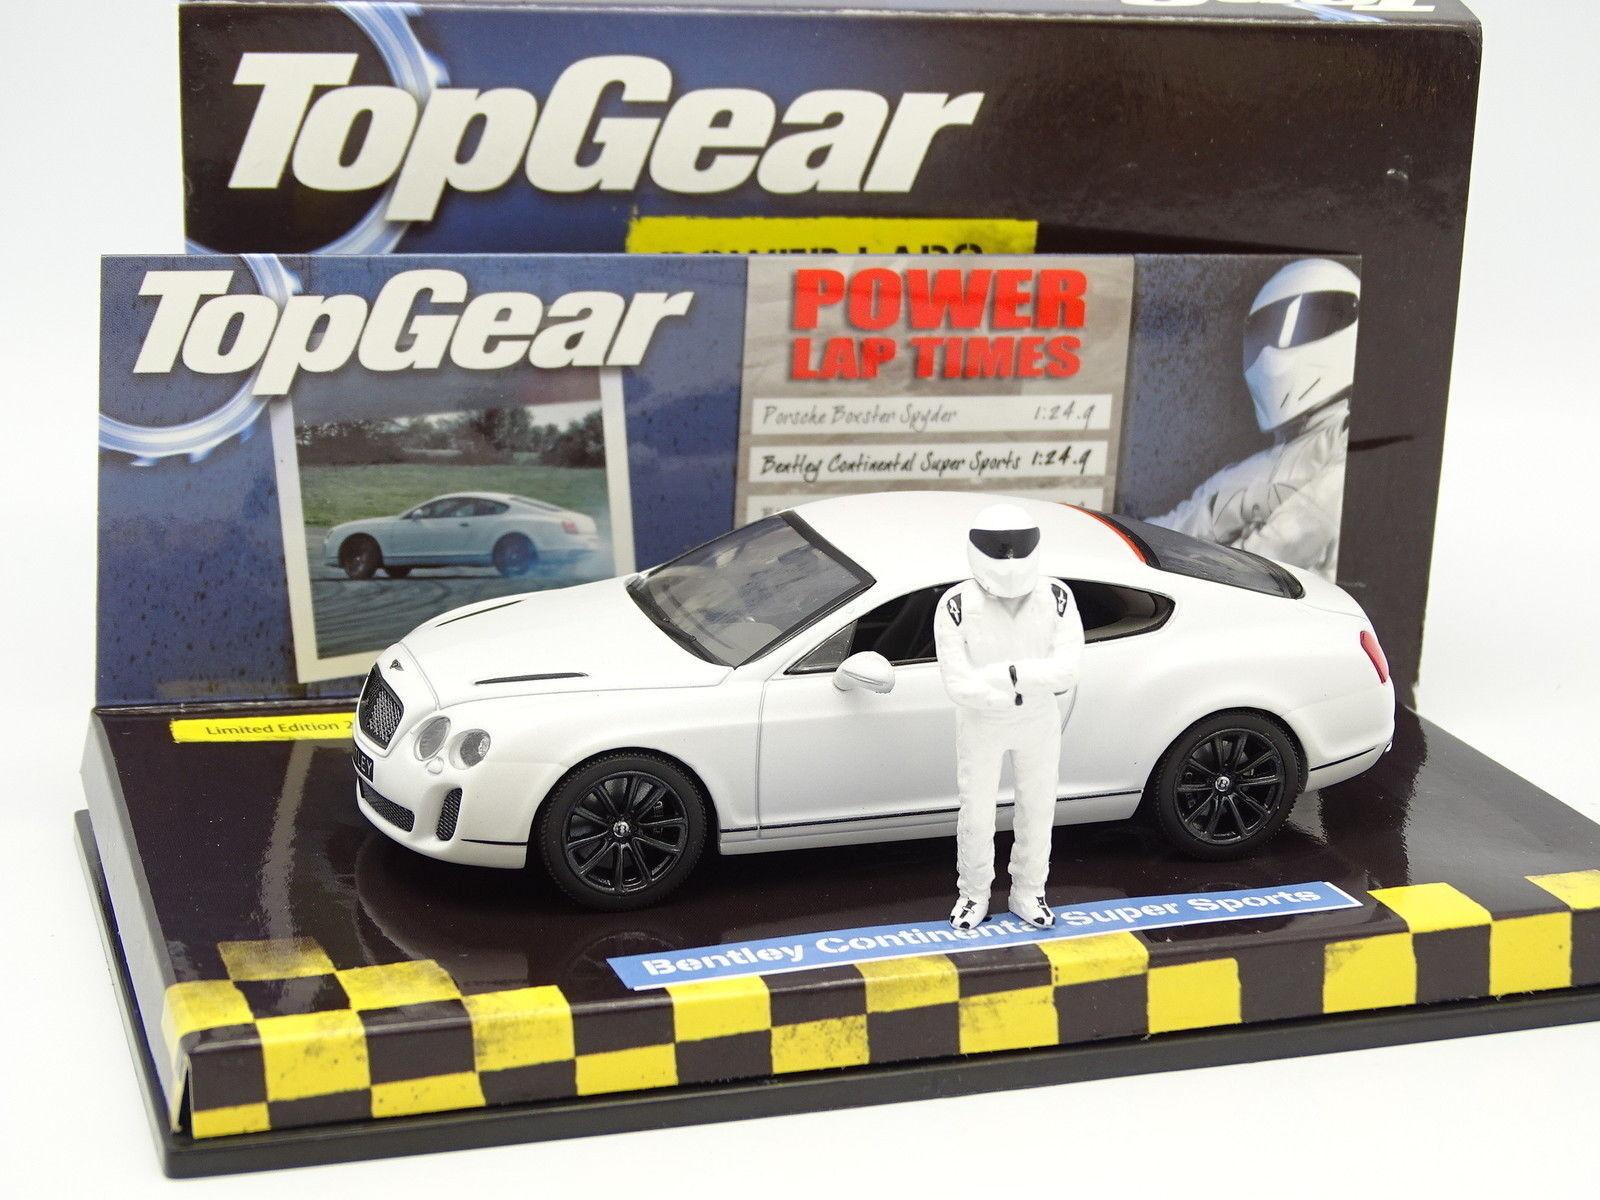 Minichamps 1 43 - Bentley Continental Super Sports Top Gear